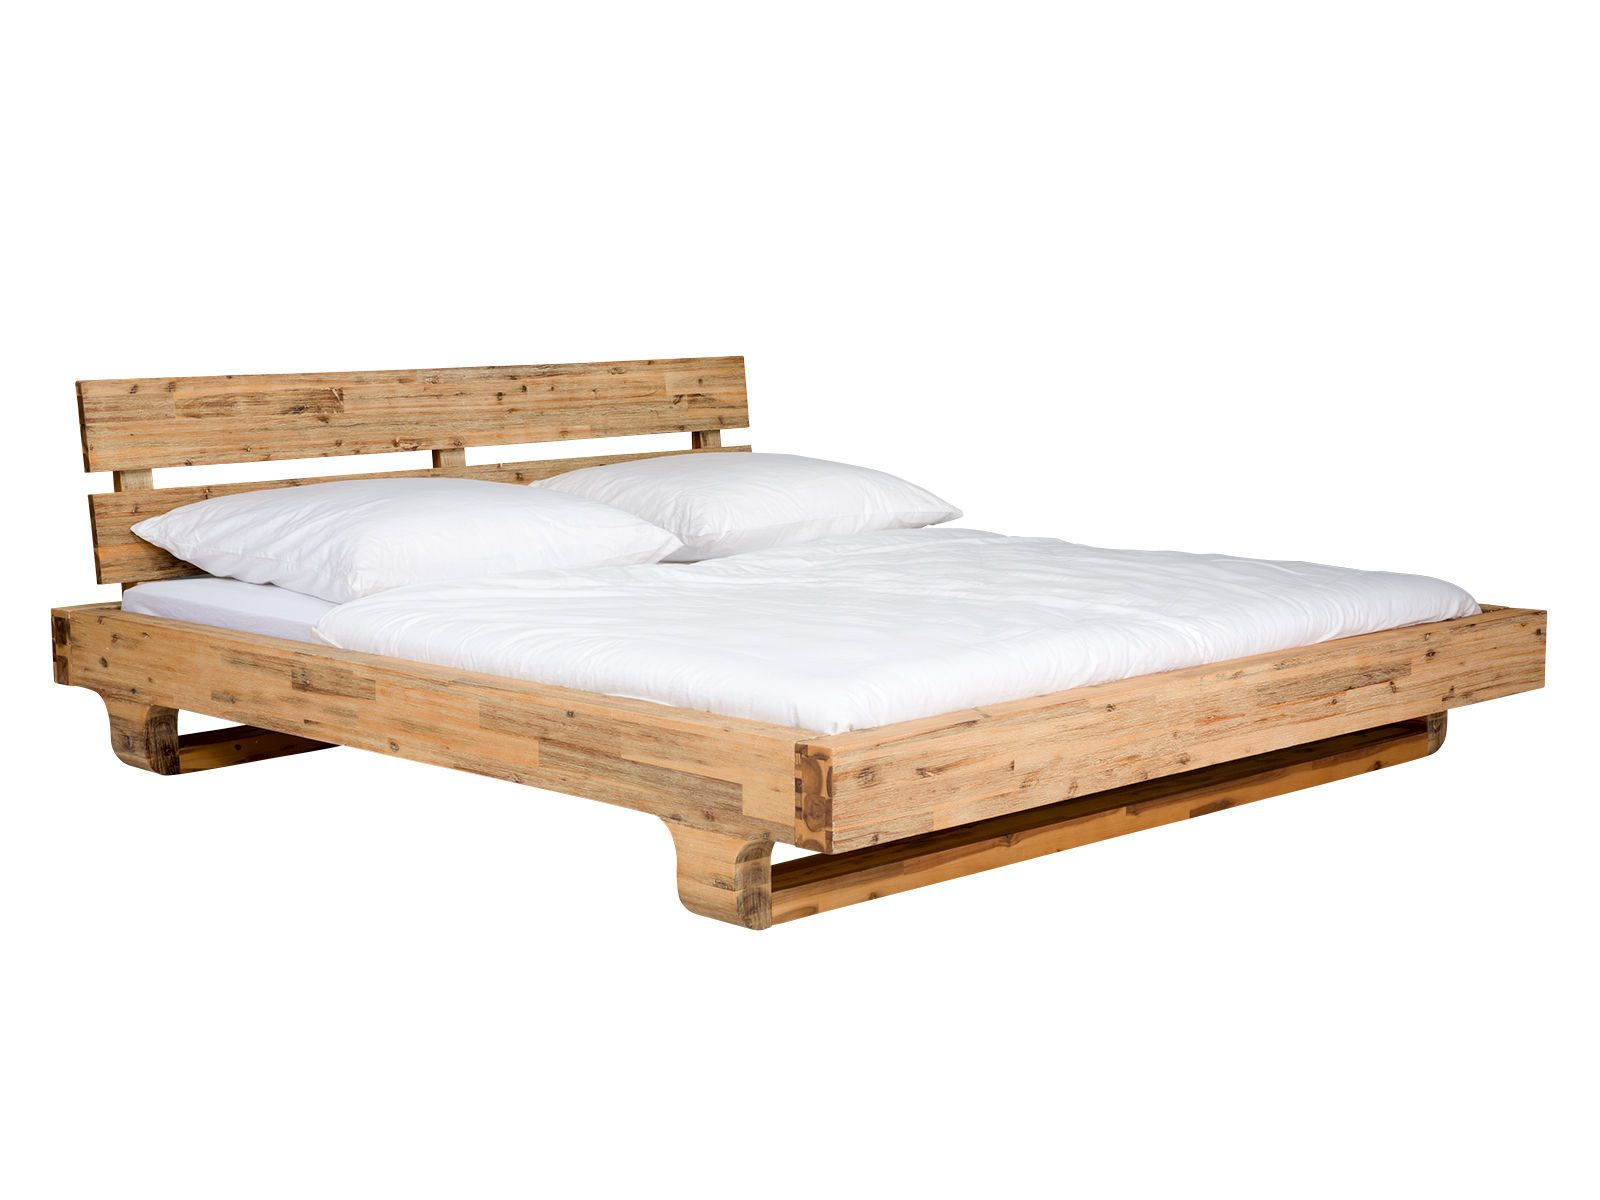 Full Size of Massivholz Betten 180x200 Xxl Lutz 140x200 Massivholzbetten Schweiz Berlin 200x200 Bett Hamburg 120x200 Kaufen Aus Doppelbetten Von Massivum Massivholzküche Bett Massivholz Betten